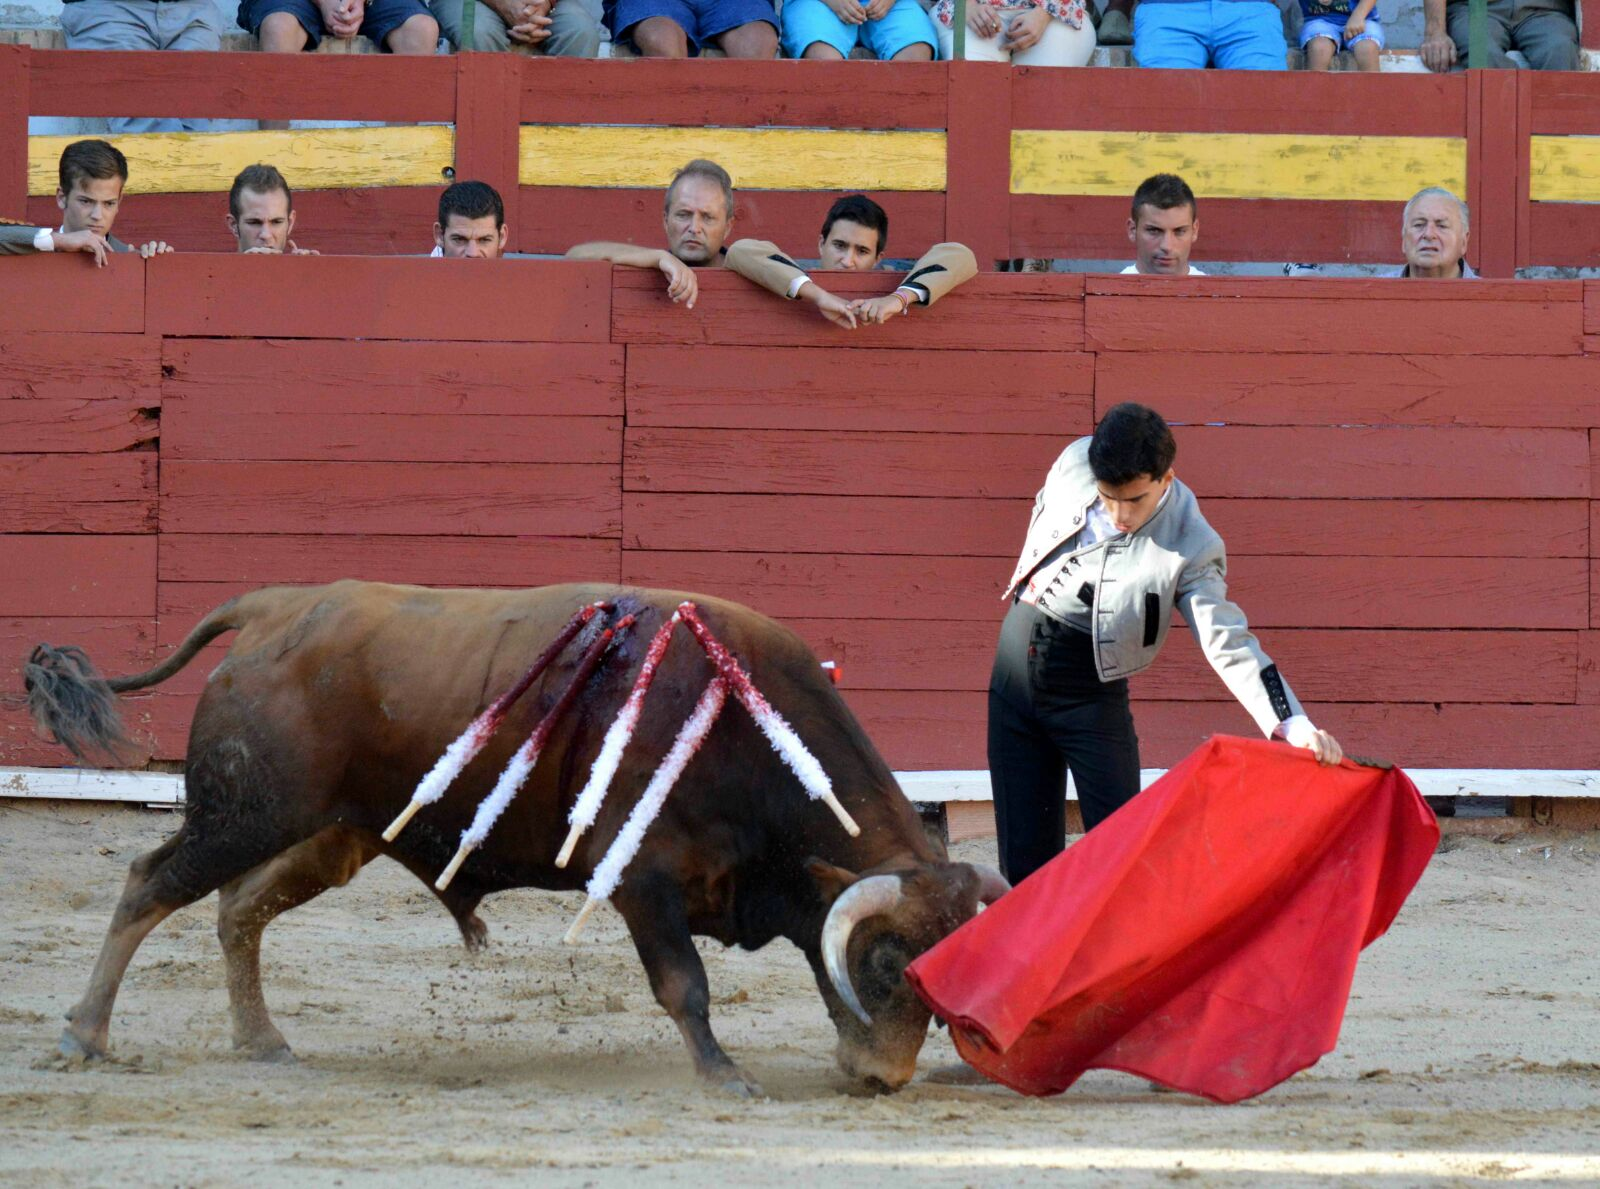 Santiago Sevilla